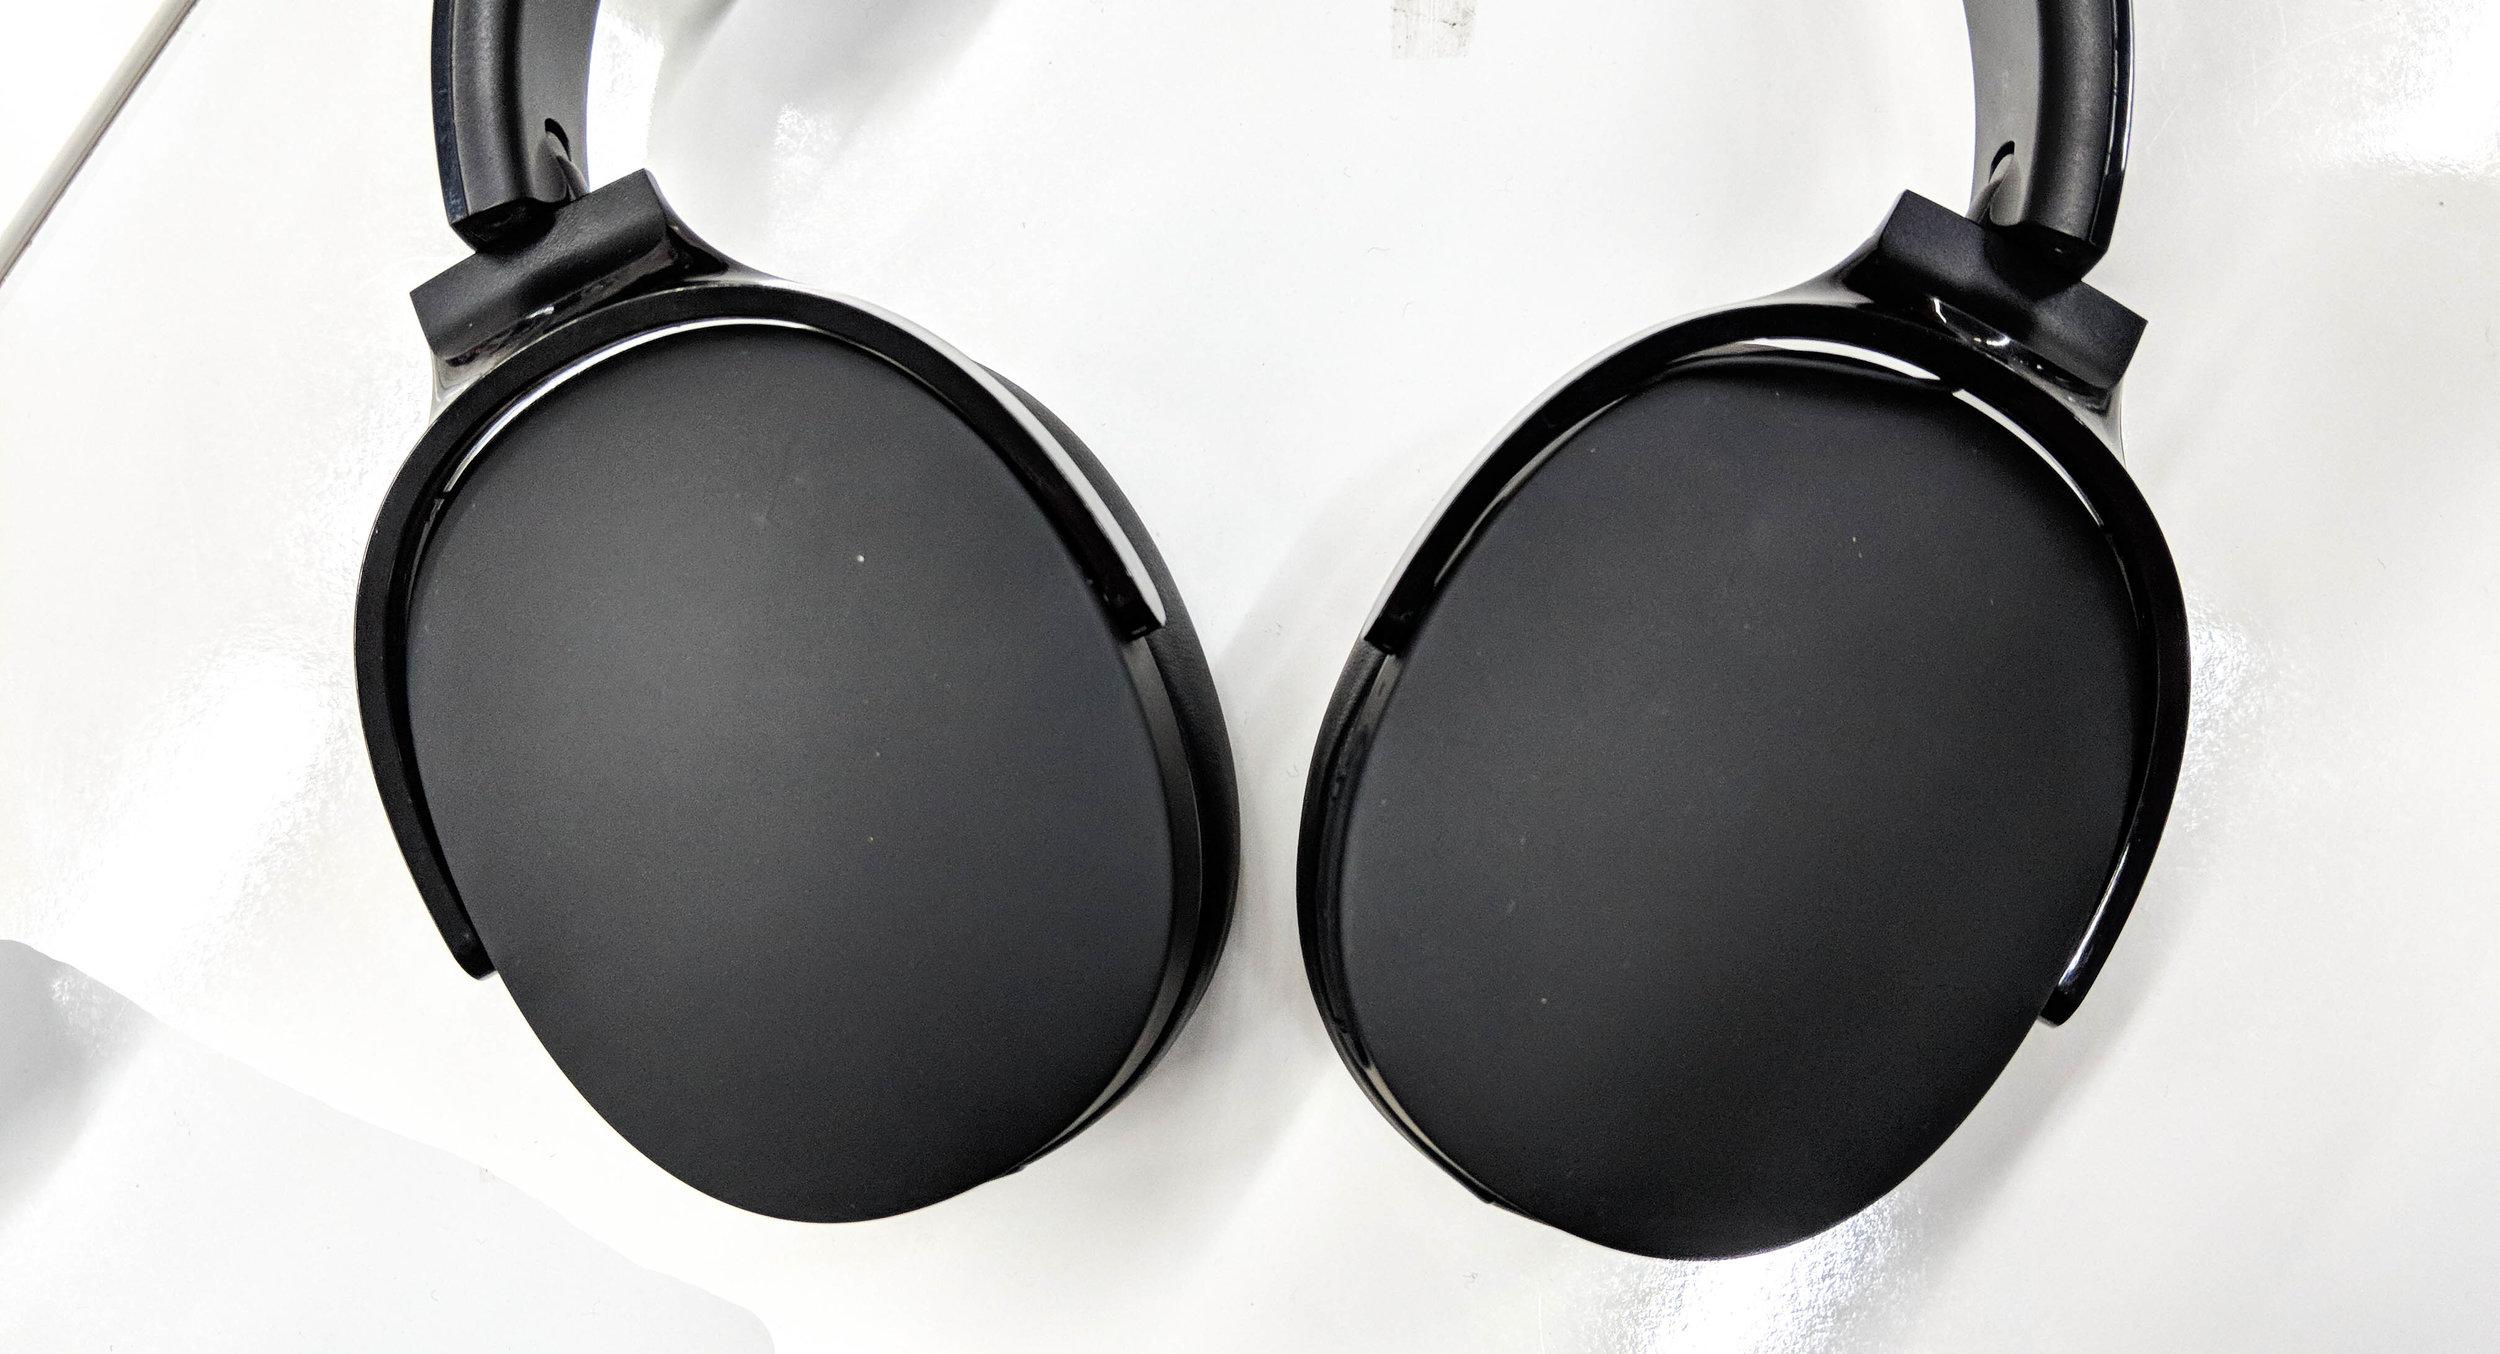 Skullcandy Hesh 3 Headphone Review